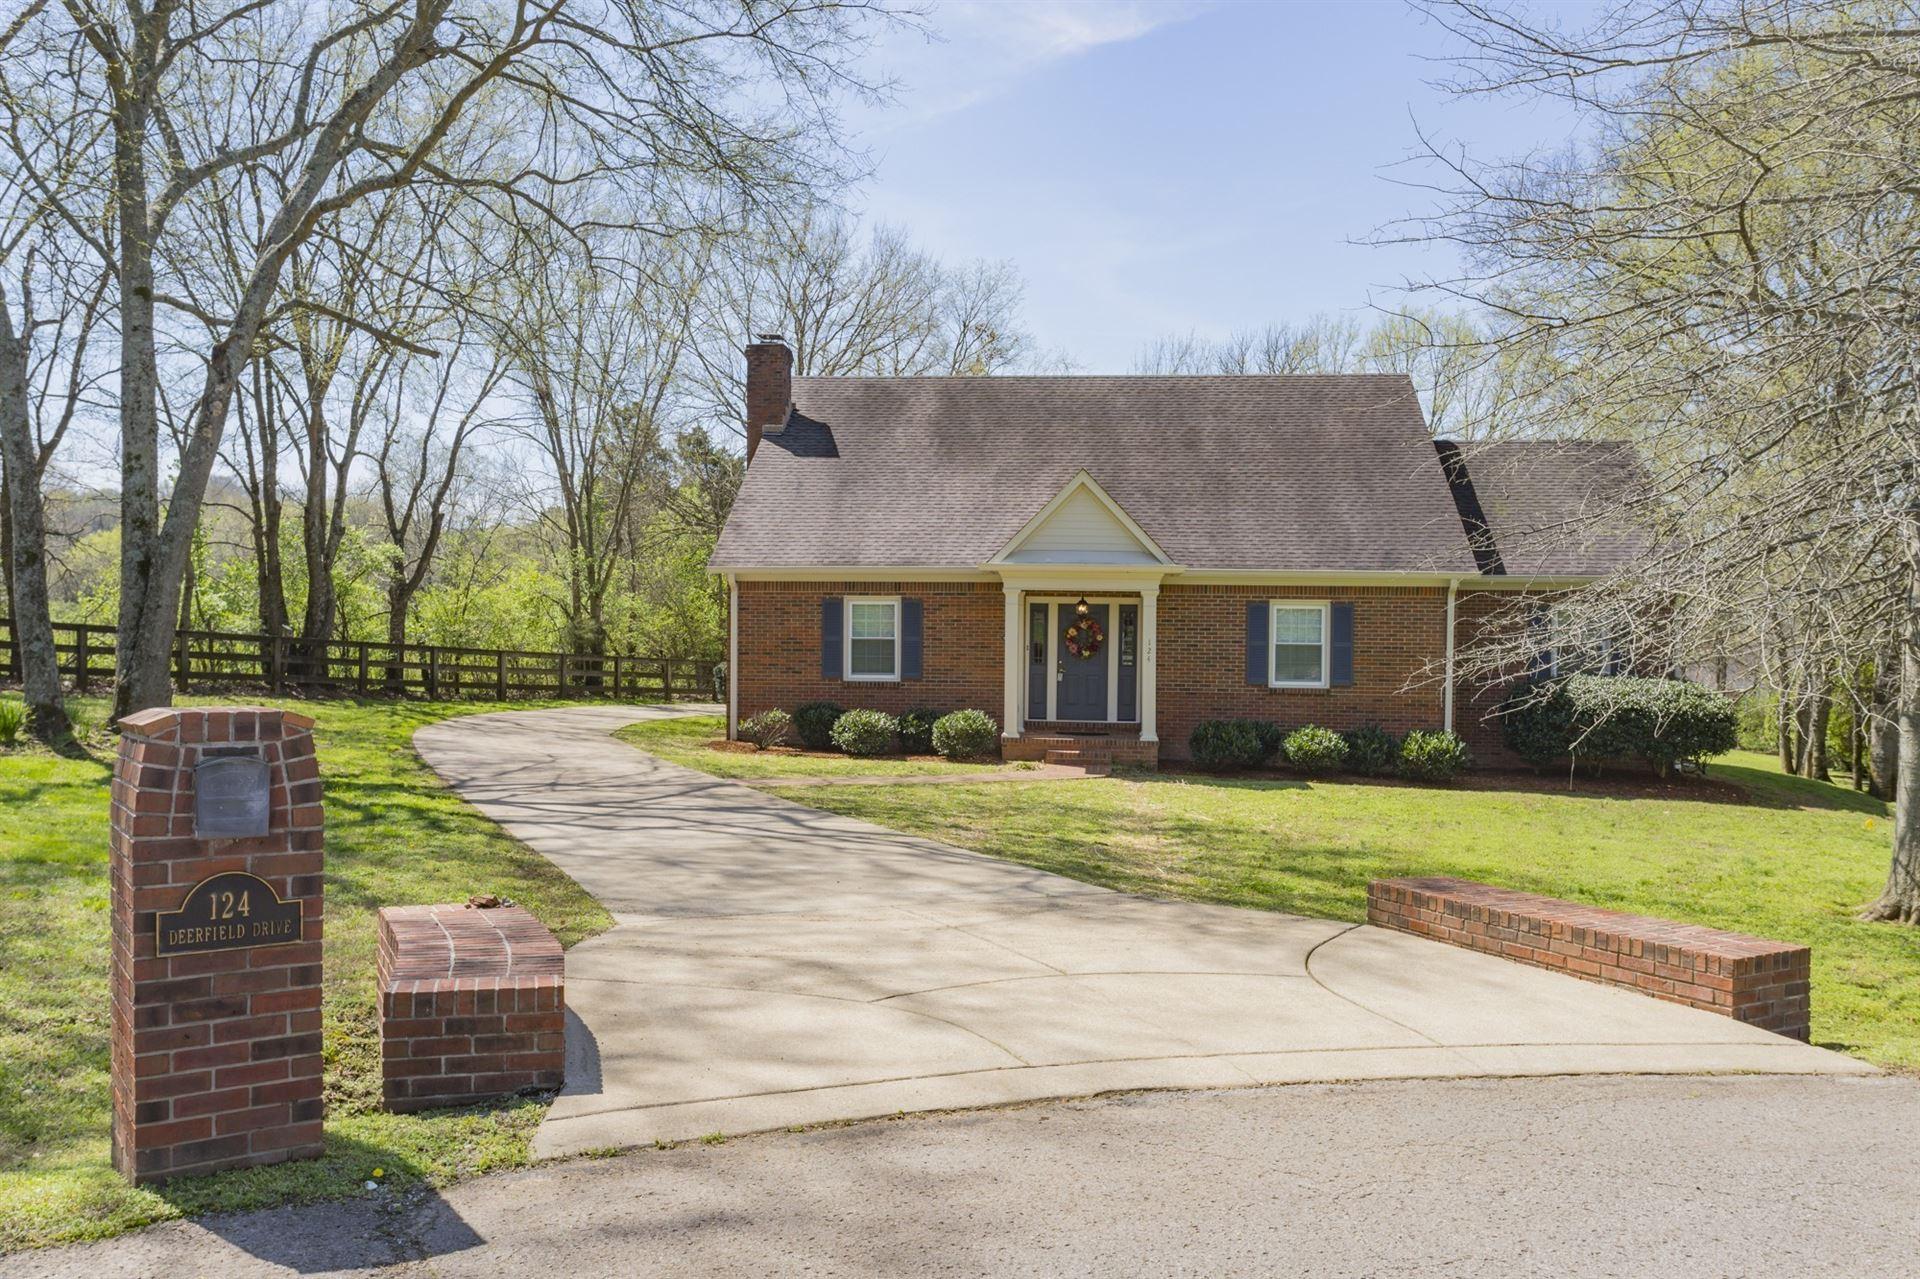 124 Deerfield Dr, Columbia, TN 38401 - MLS#: 2180820